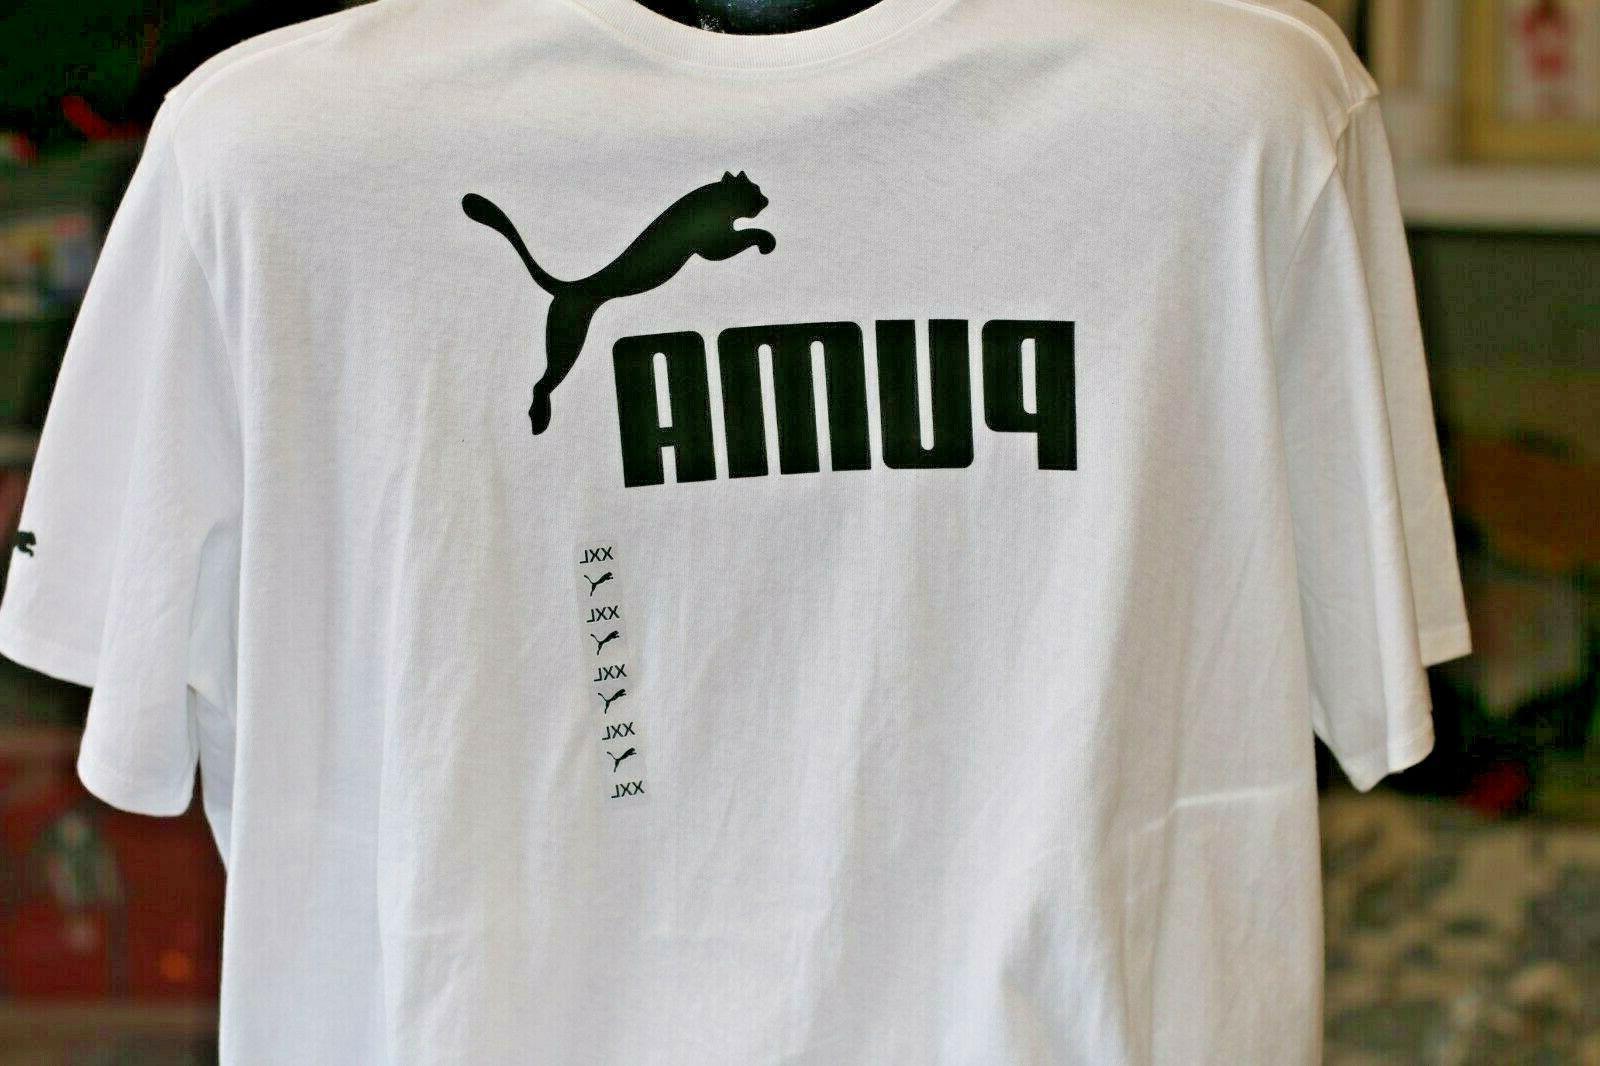 Adidas Men's Trefoil Logo Graphic T-Shirt and